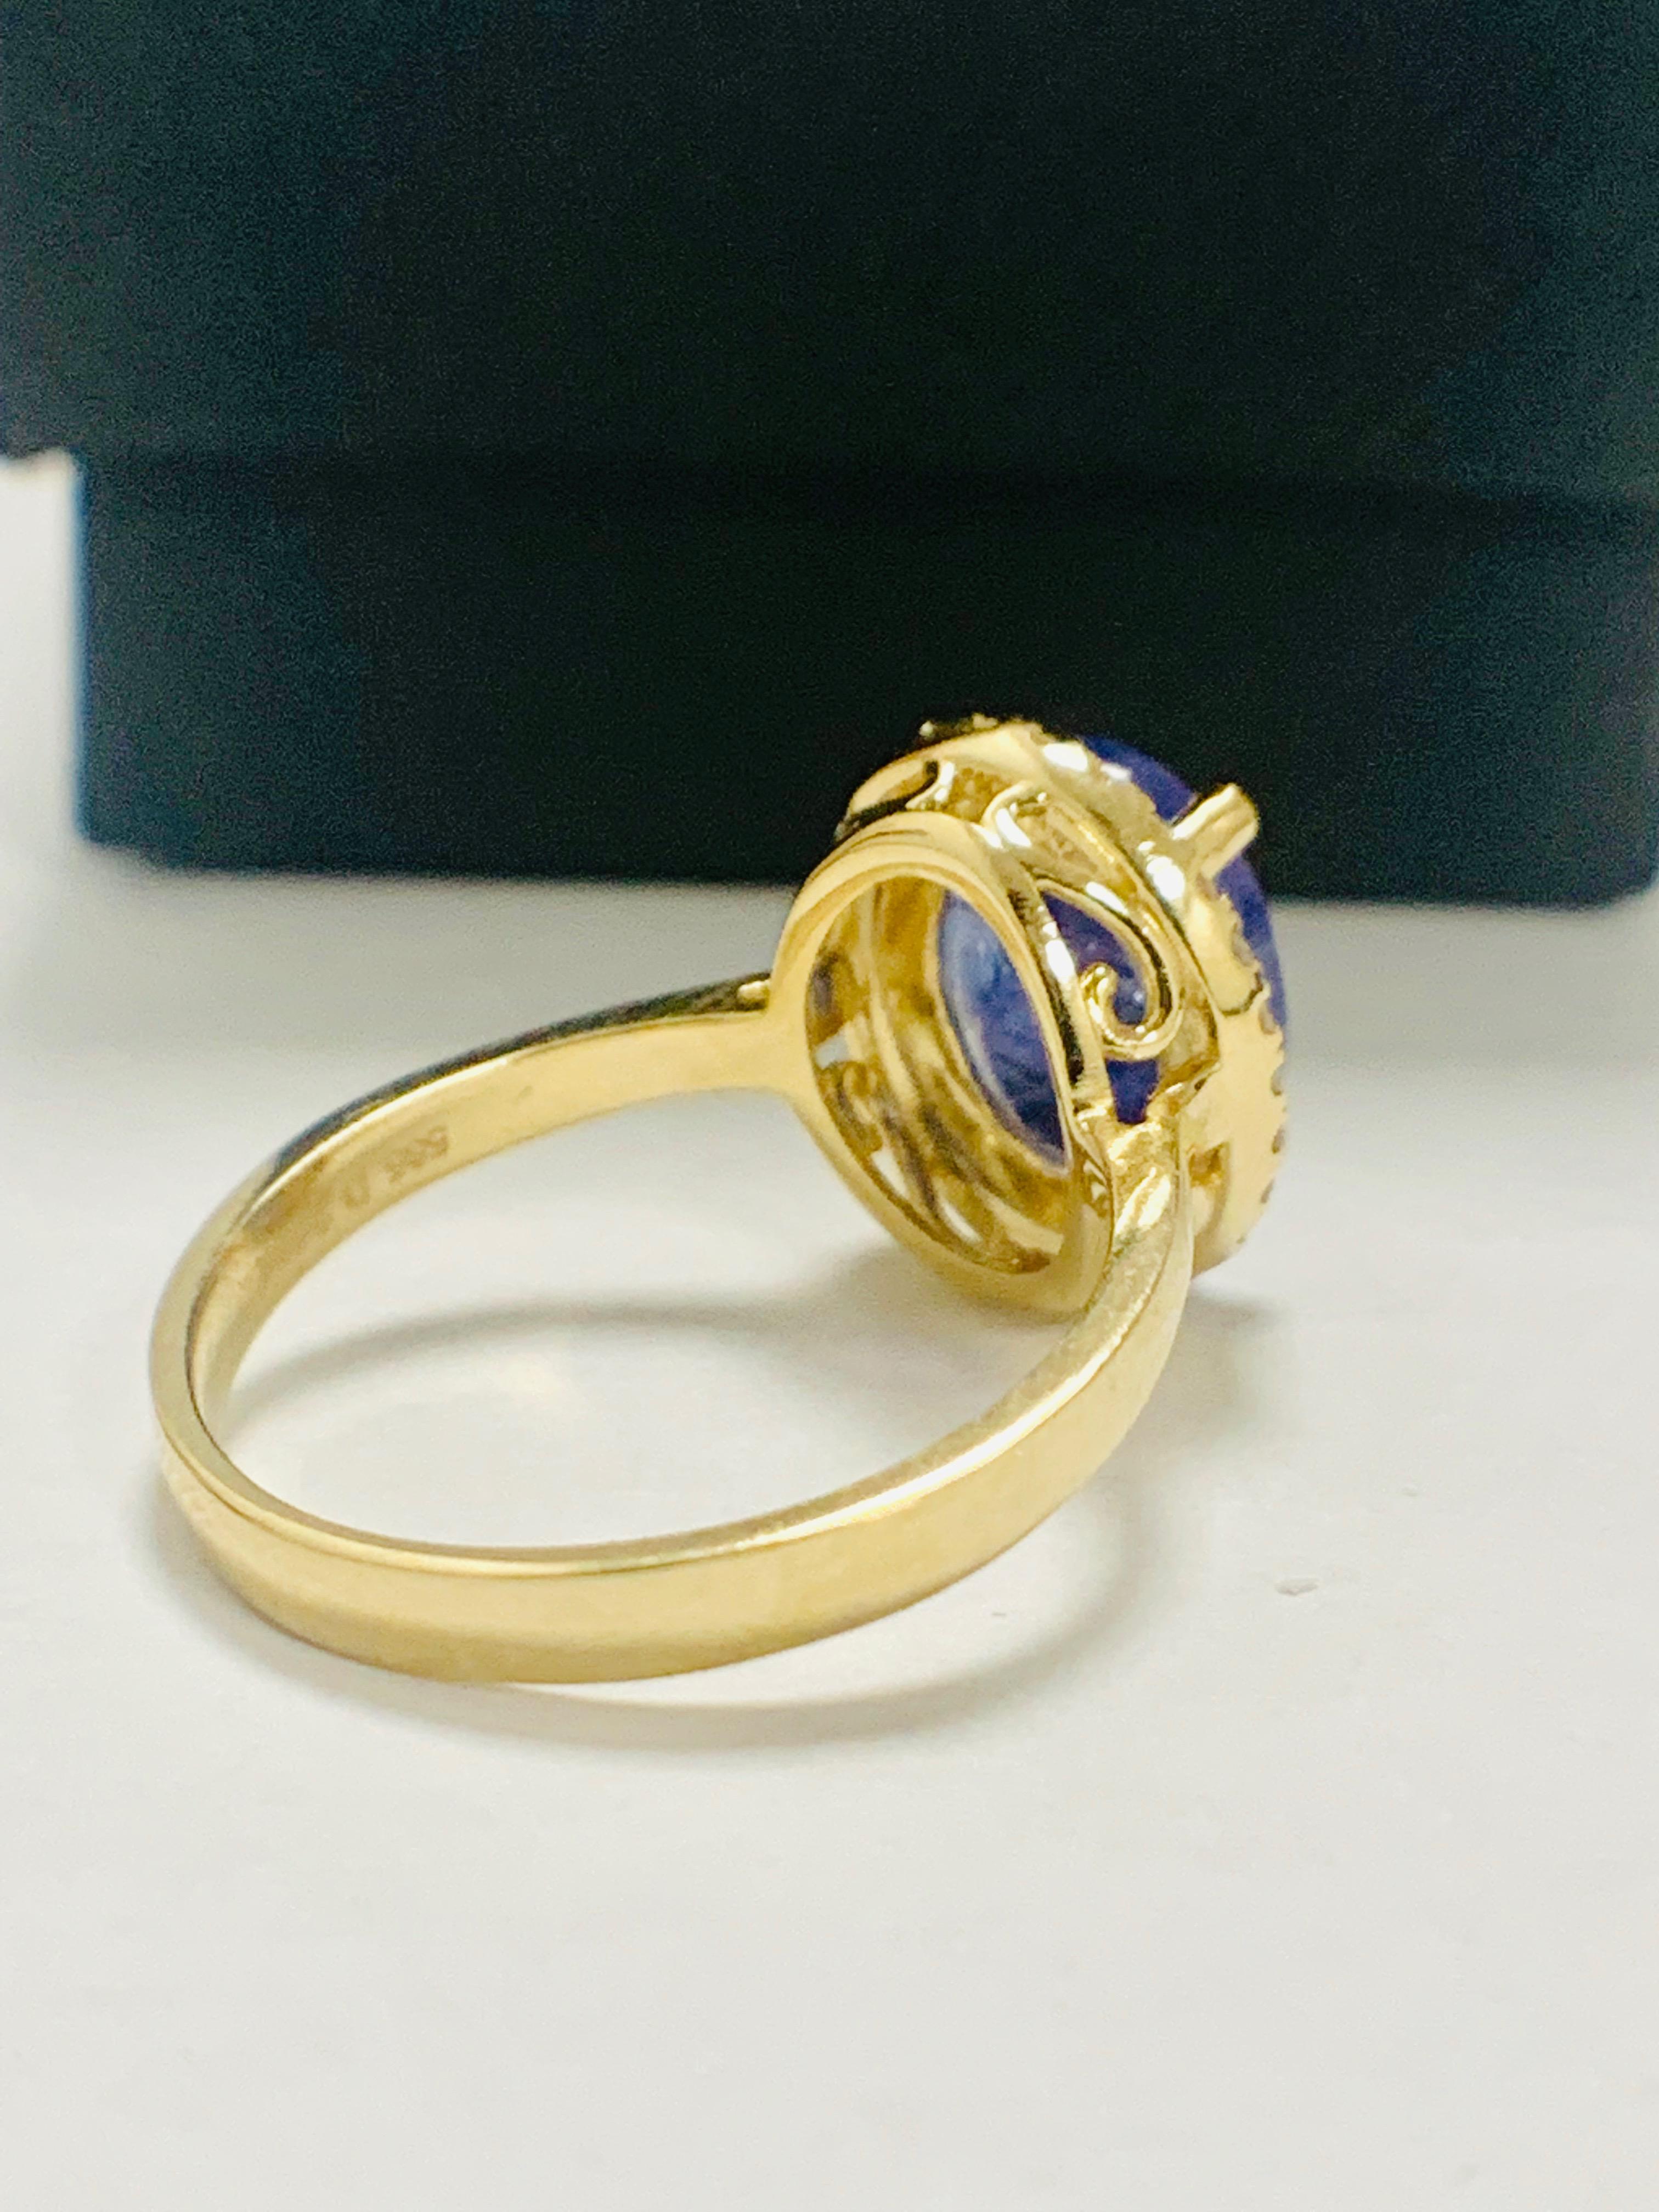 14ct Yellow Gold Tanzanite and Diamond ring - Image 7 of 13